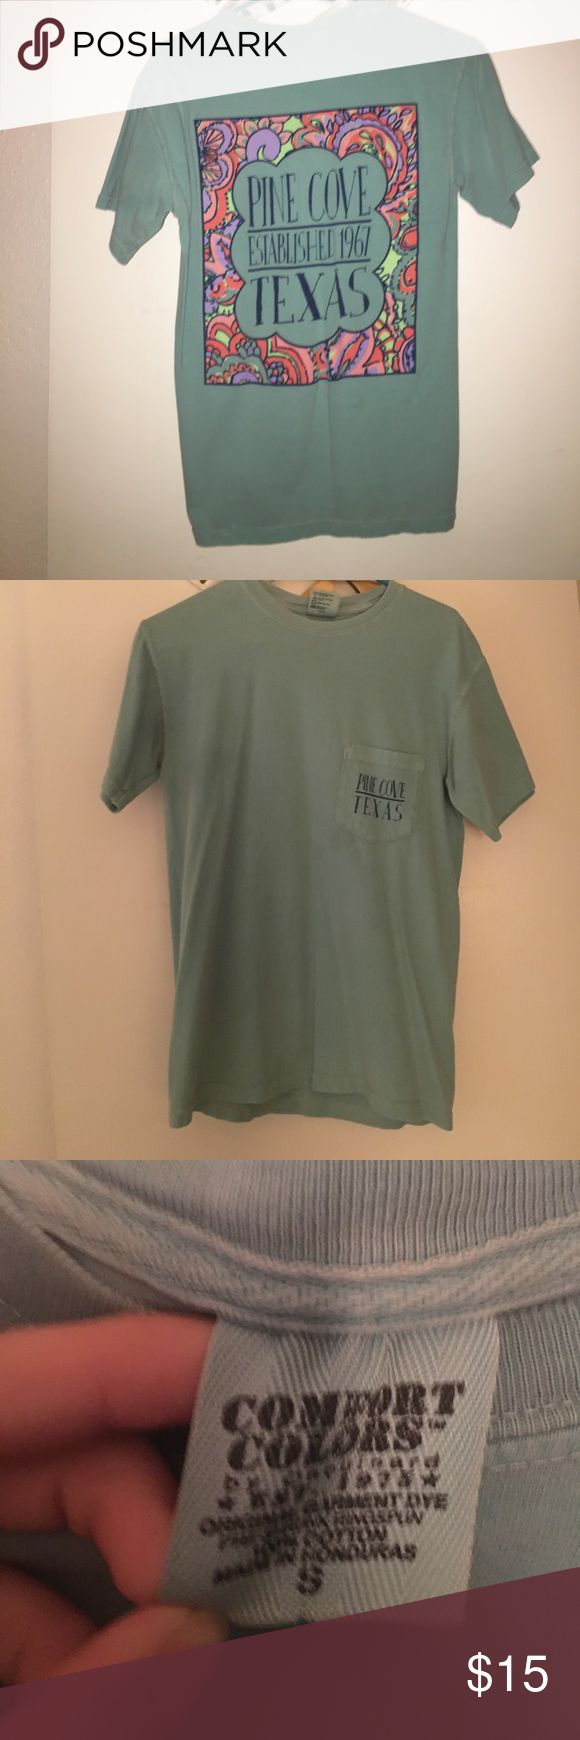 pine cove camps comfort colors tshirt super cute tshirt i got at summer camp, no longer fits that's why i'm selling comfort colors Tops Tees - Short Sleeve